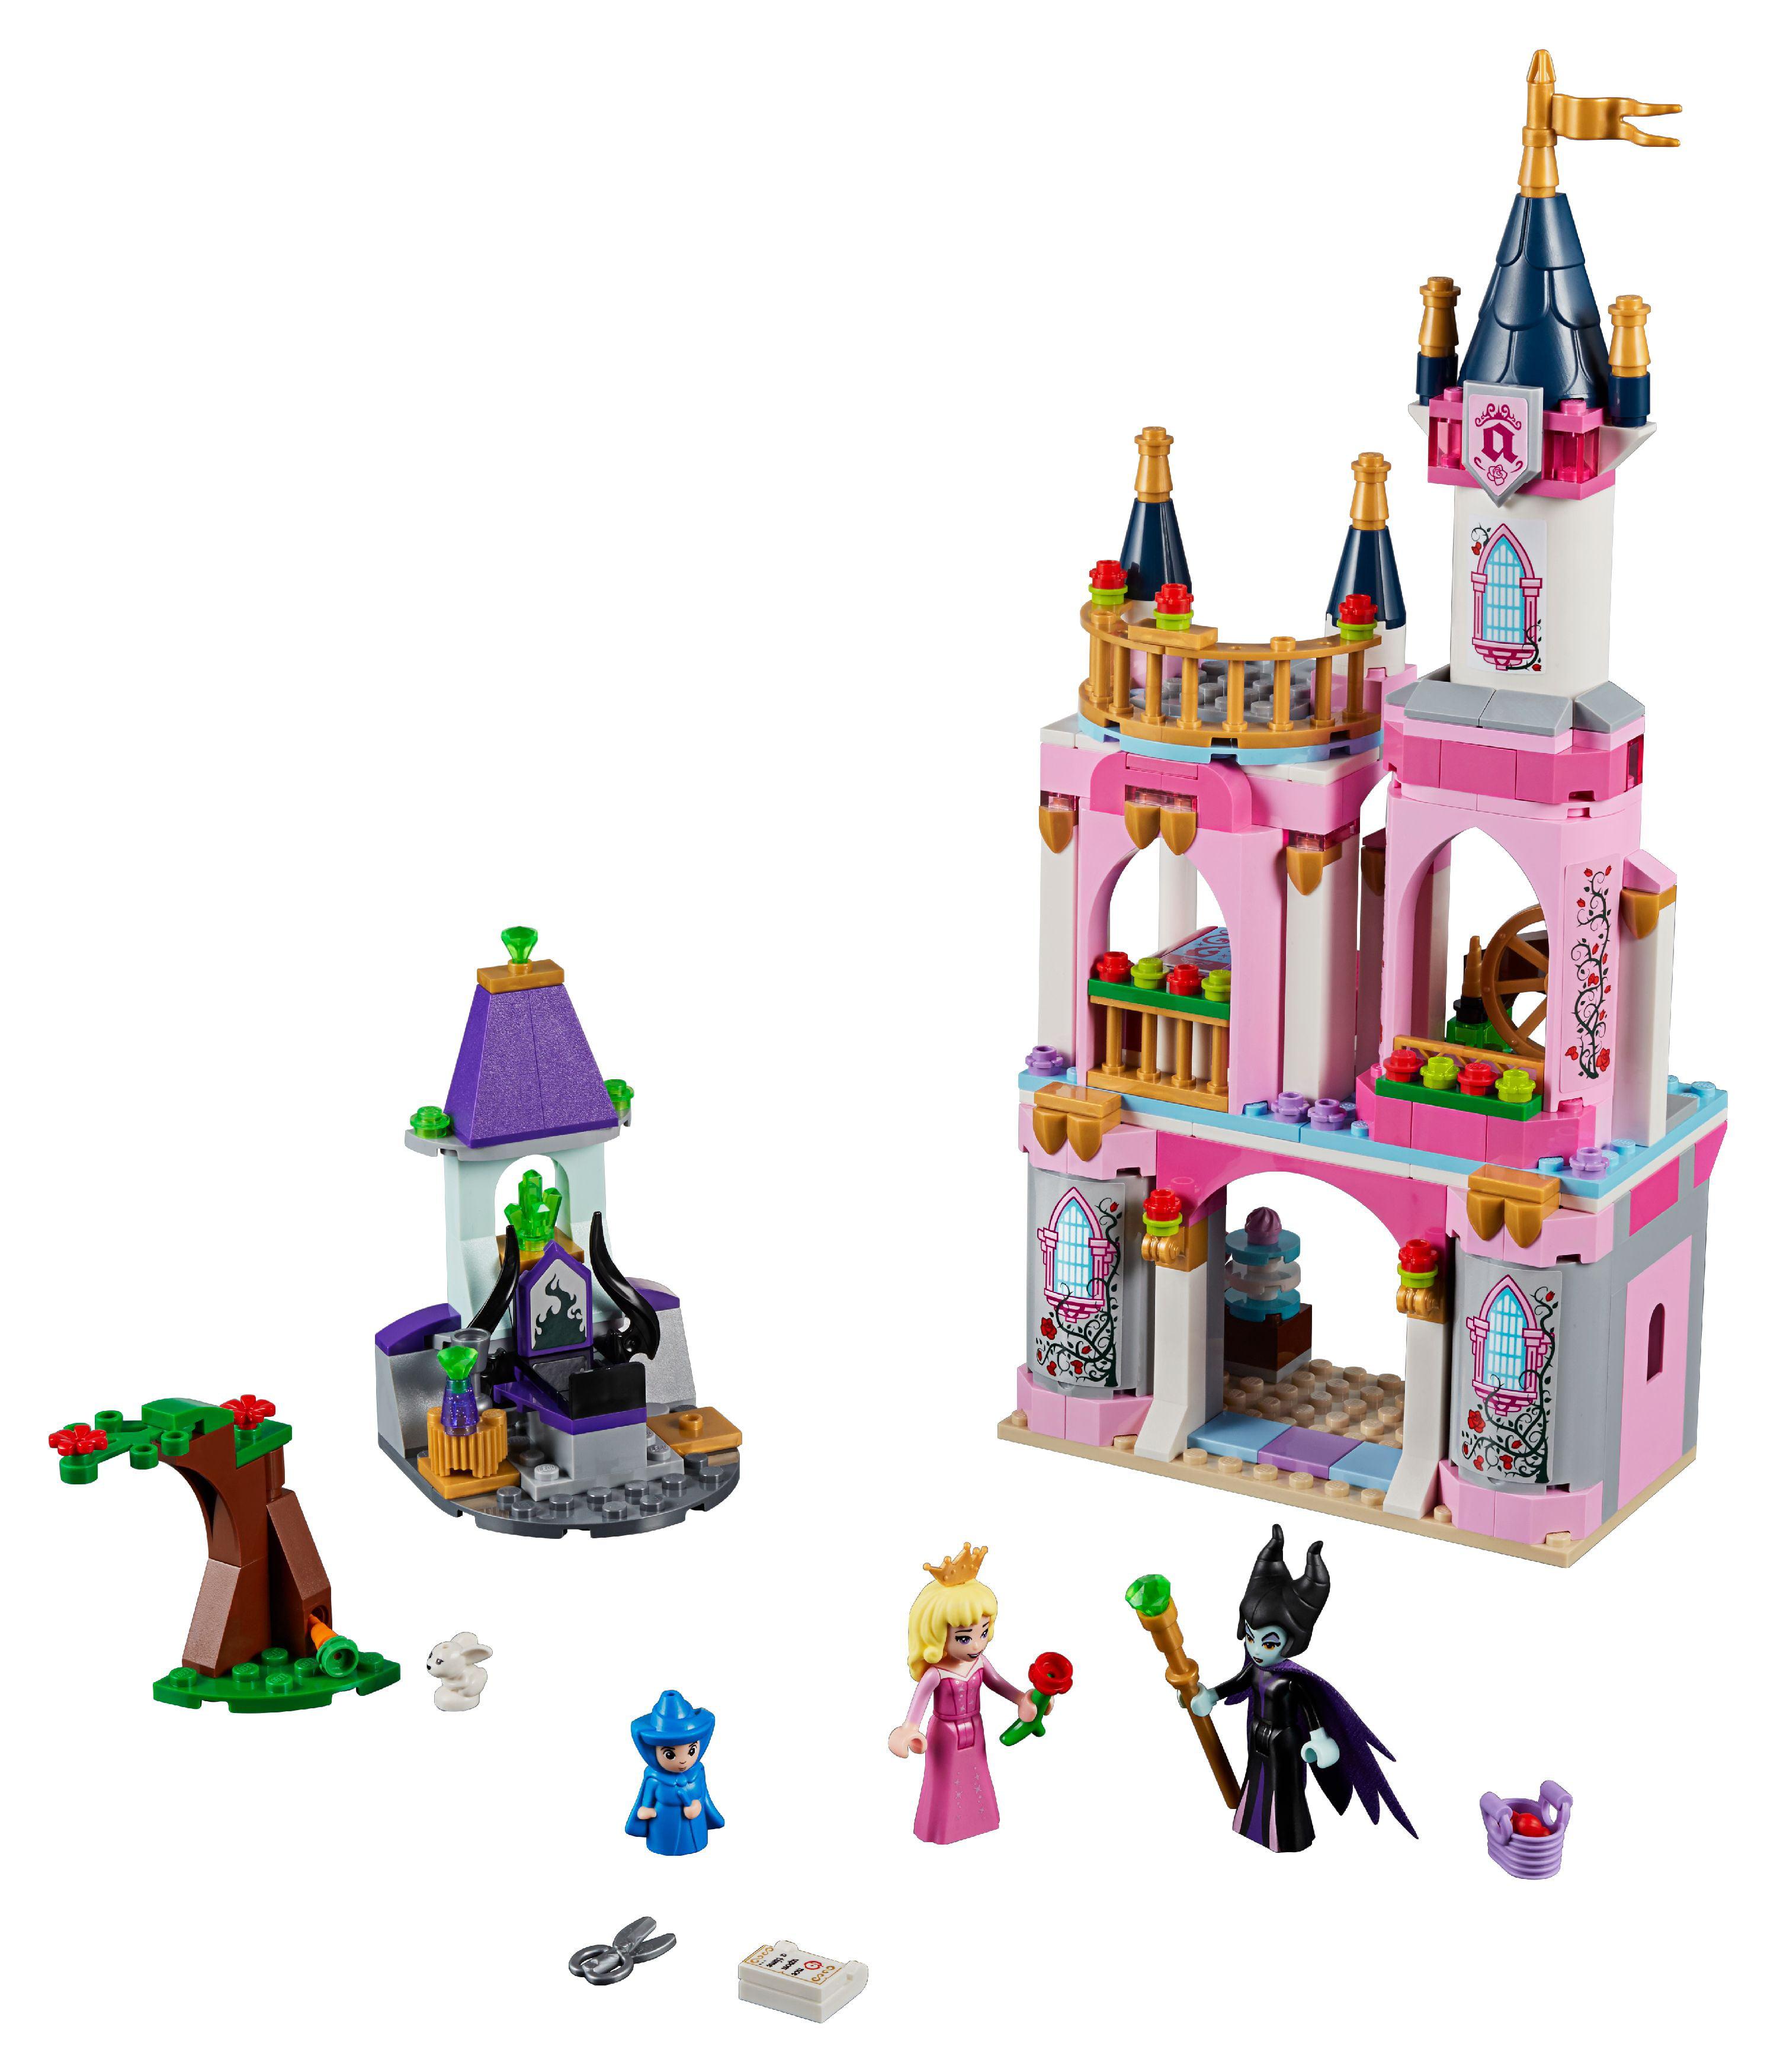 f59b238b655 LEGO Disney Princess Sleeping Beauty s Fairytale Castle 41152 - Walmart.com